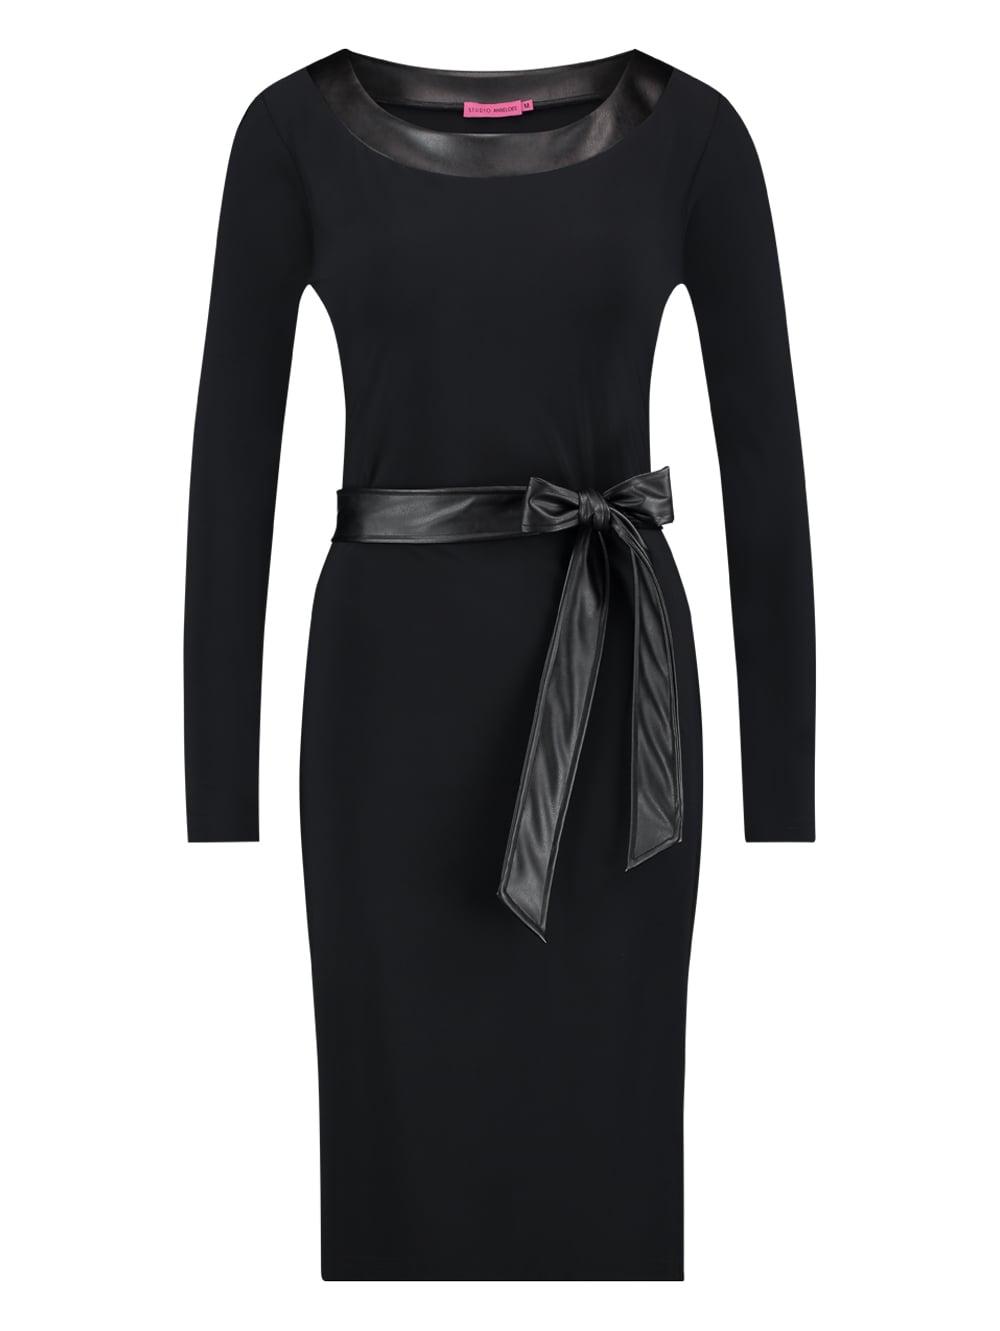 jurk zwart leer